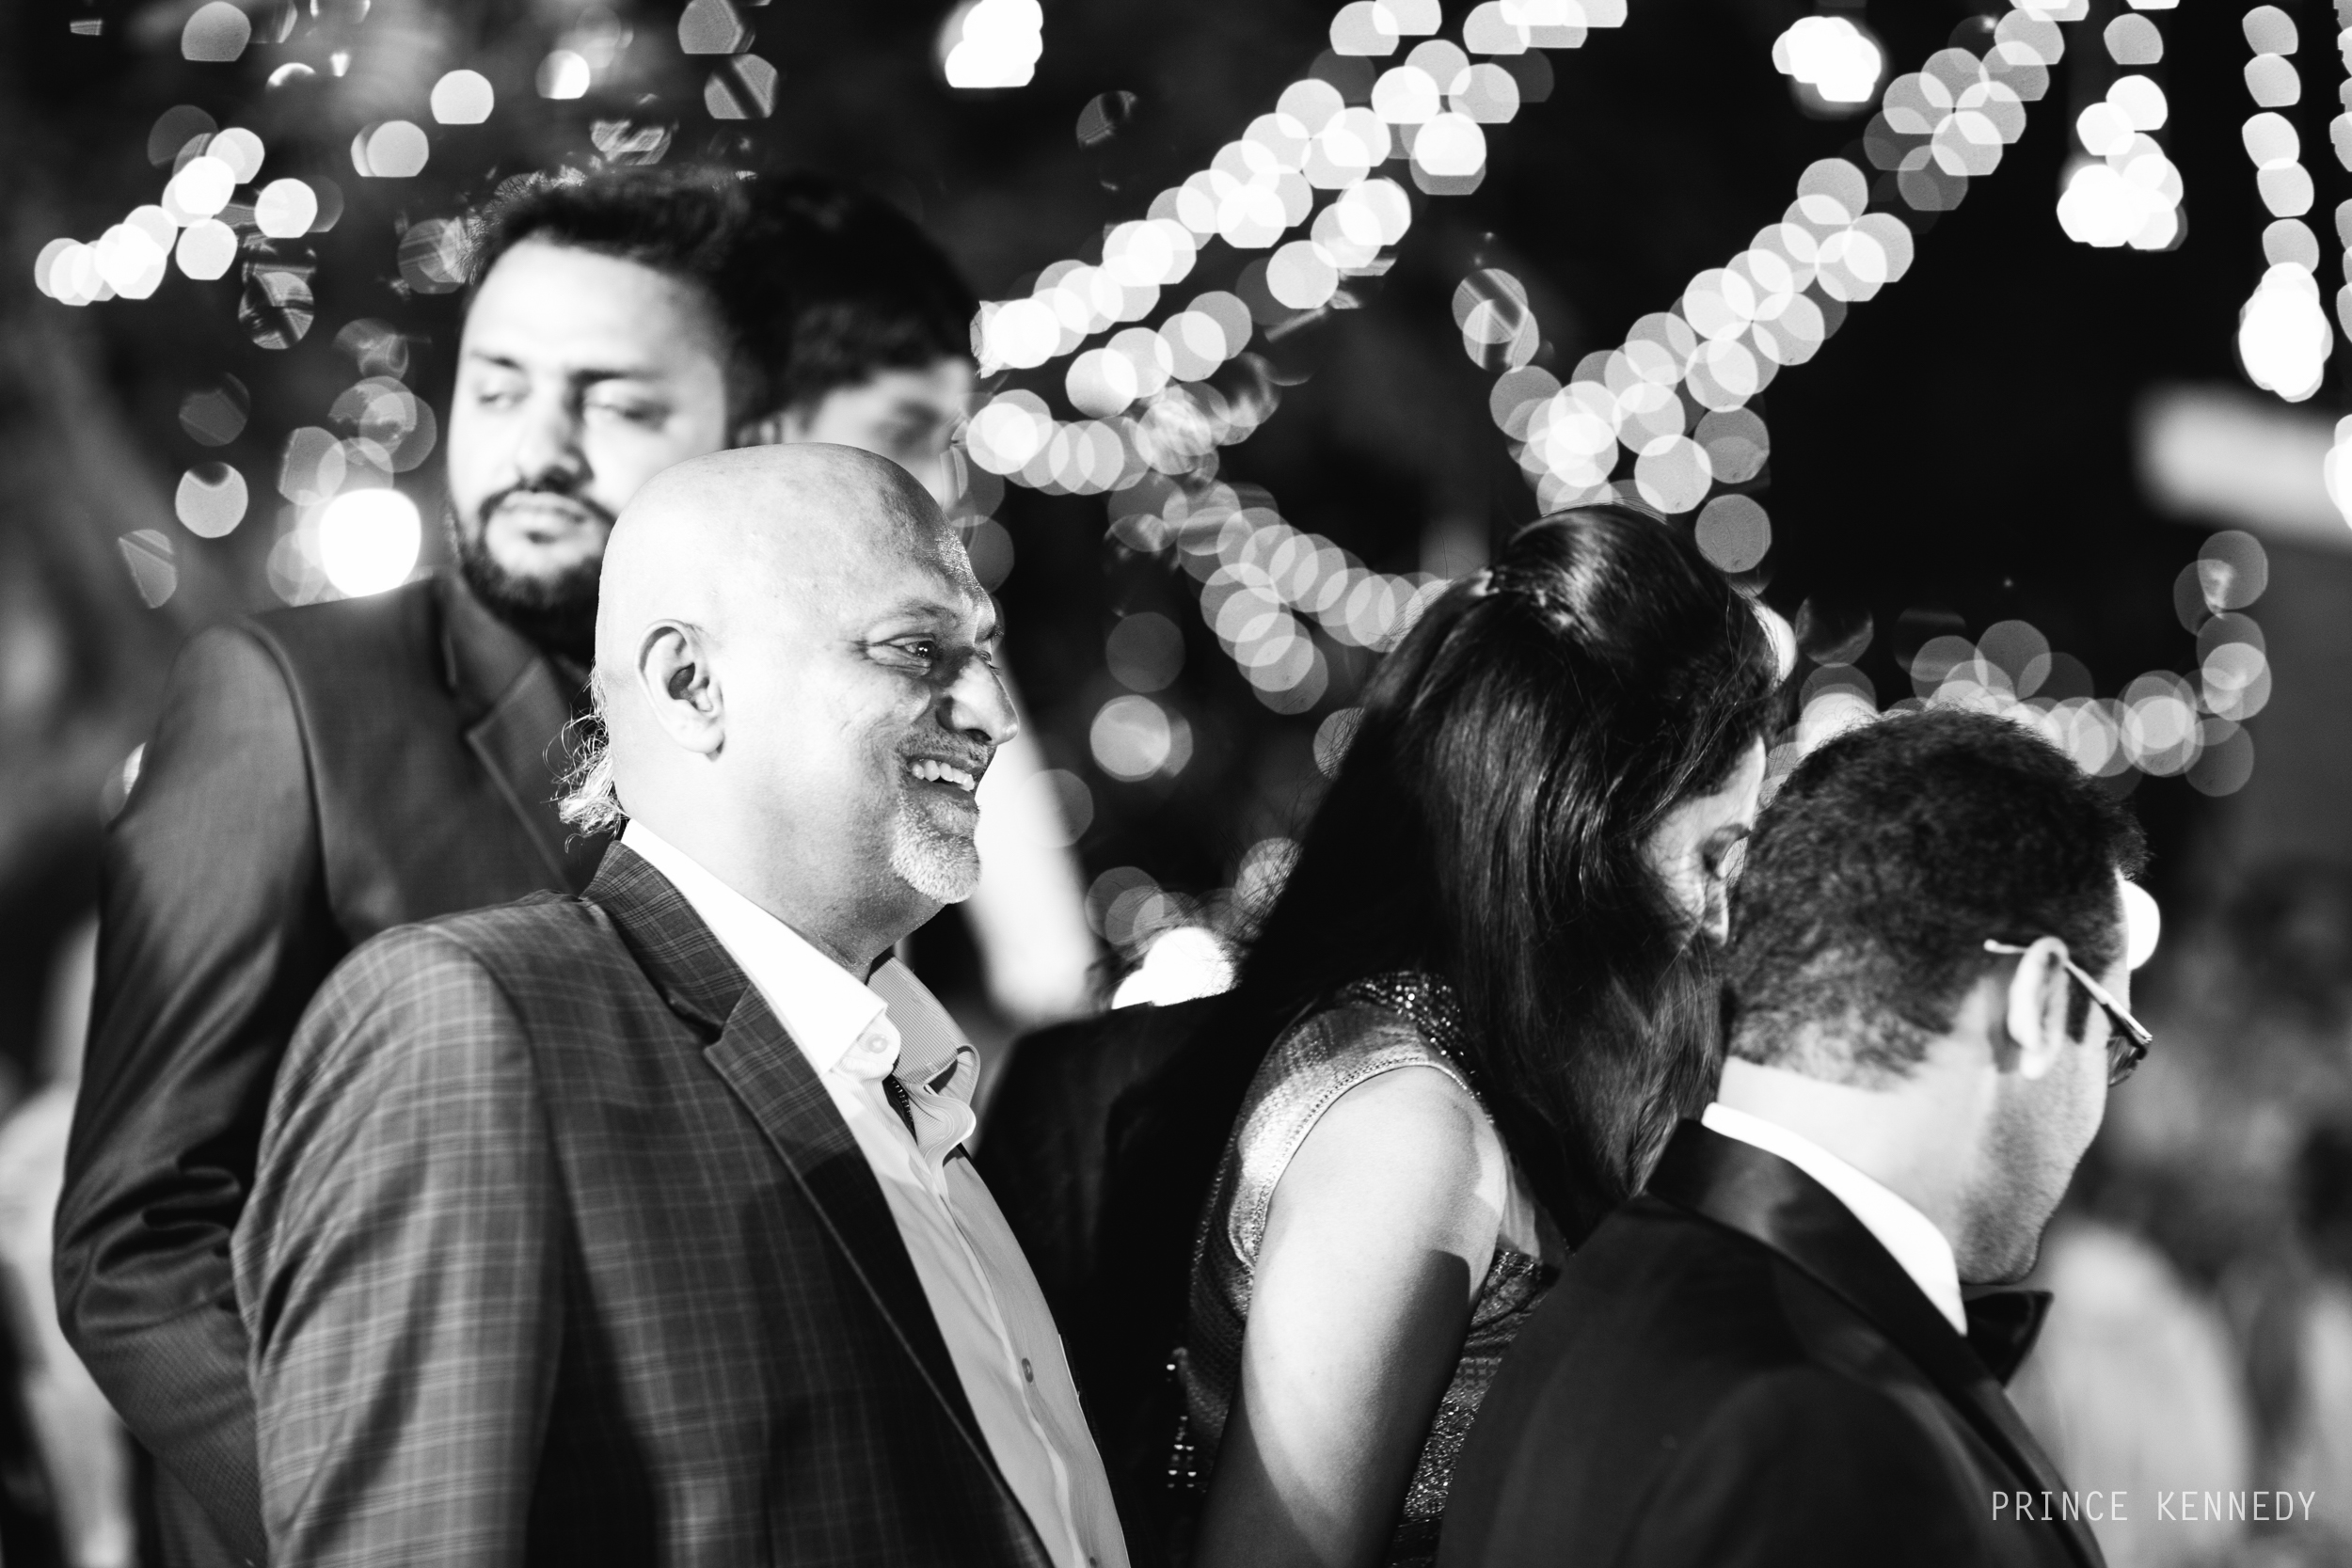 Athmajja-Nithesh-Engagement-Couple-Portrait-Portraiture-Wedding-Couple-Portrait-Chennai-Photographer-Candid-Photography-Destination-Best-Prince-Kennedy-Photography-79.jpg